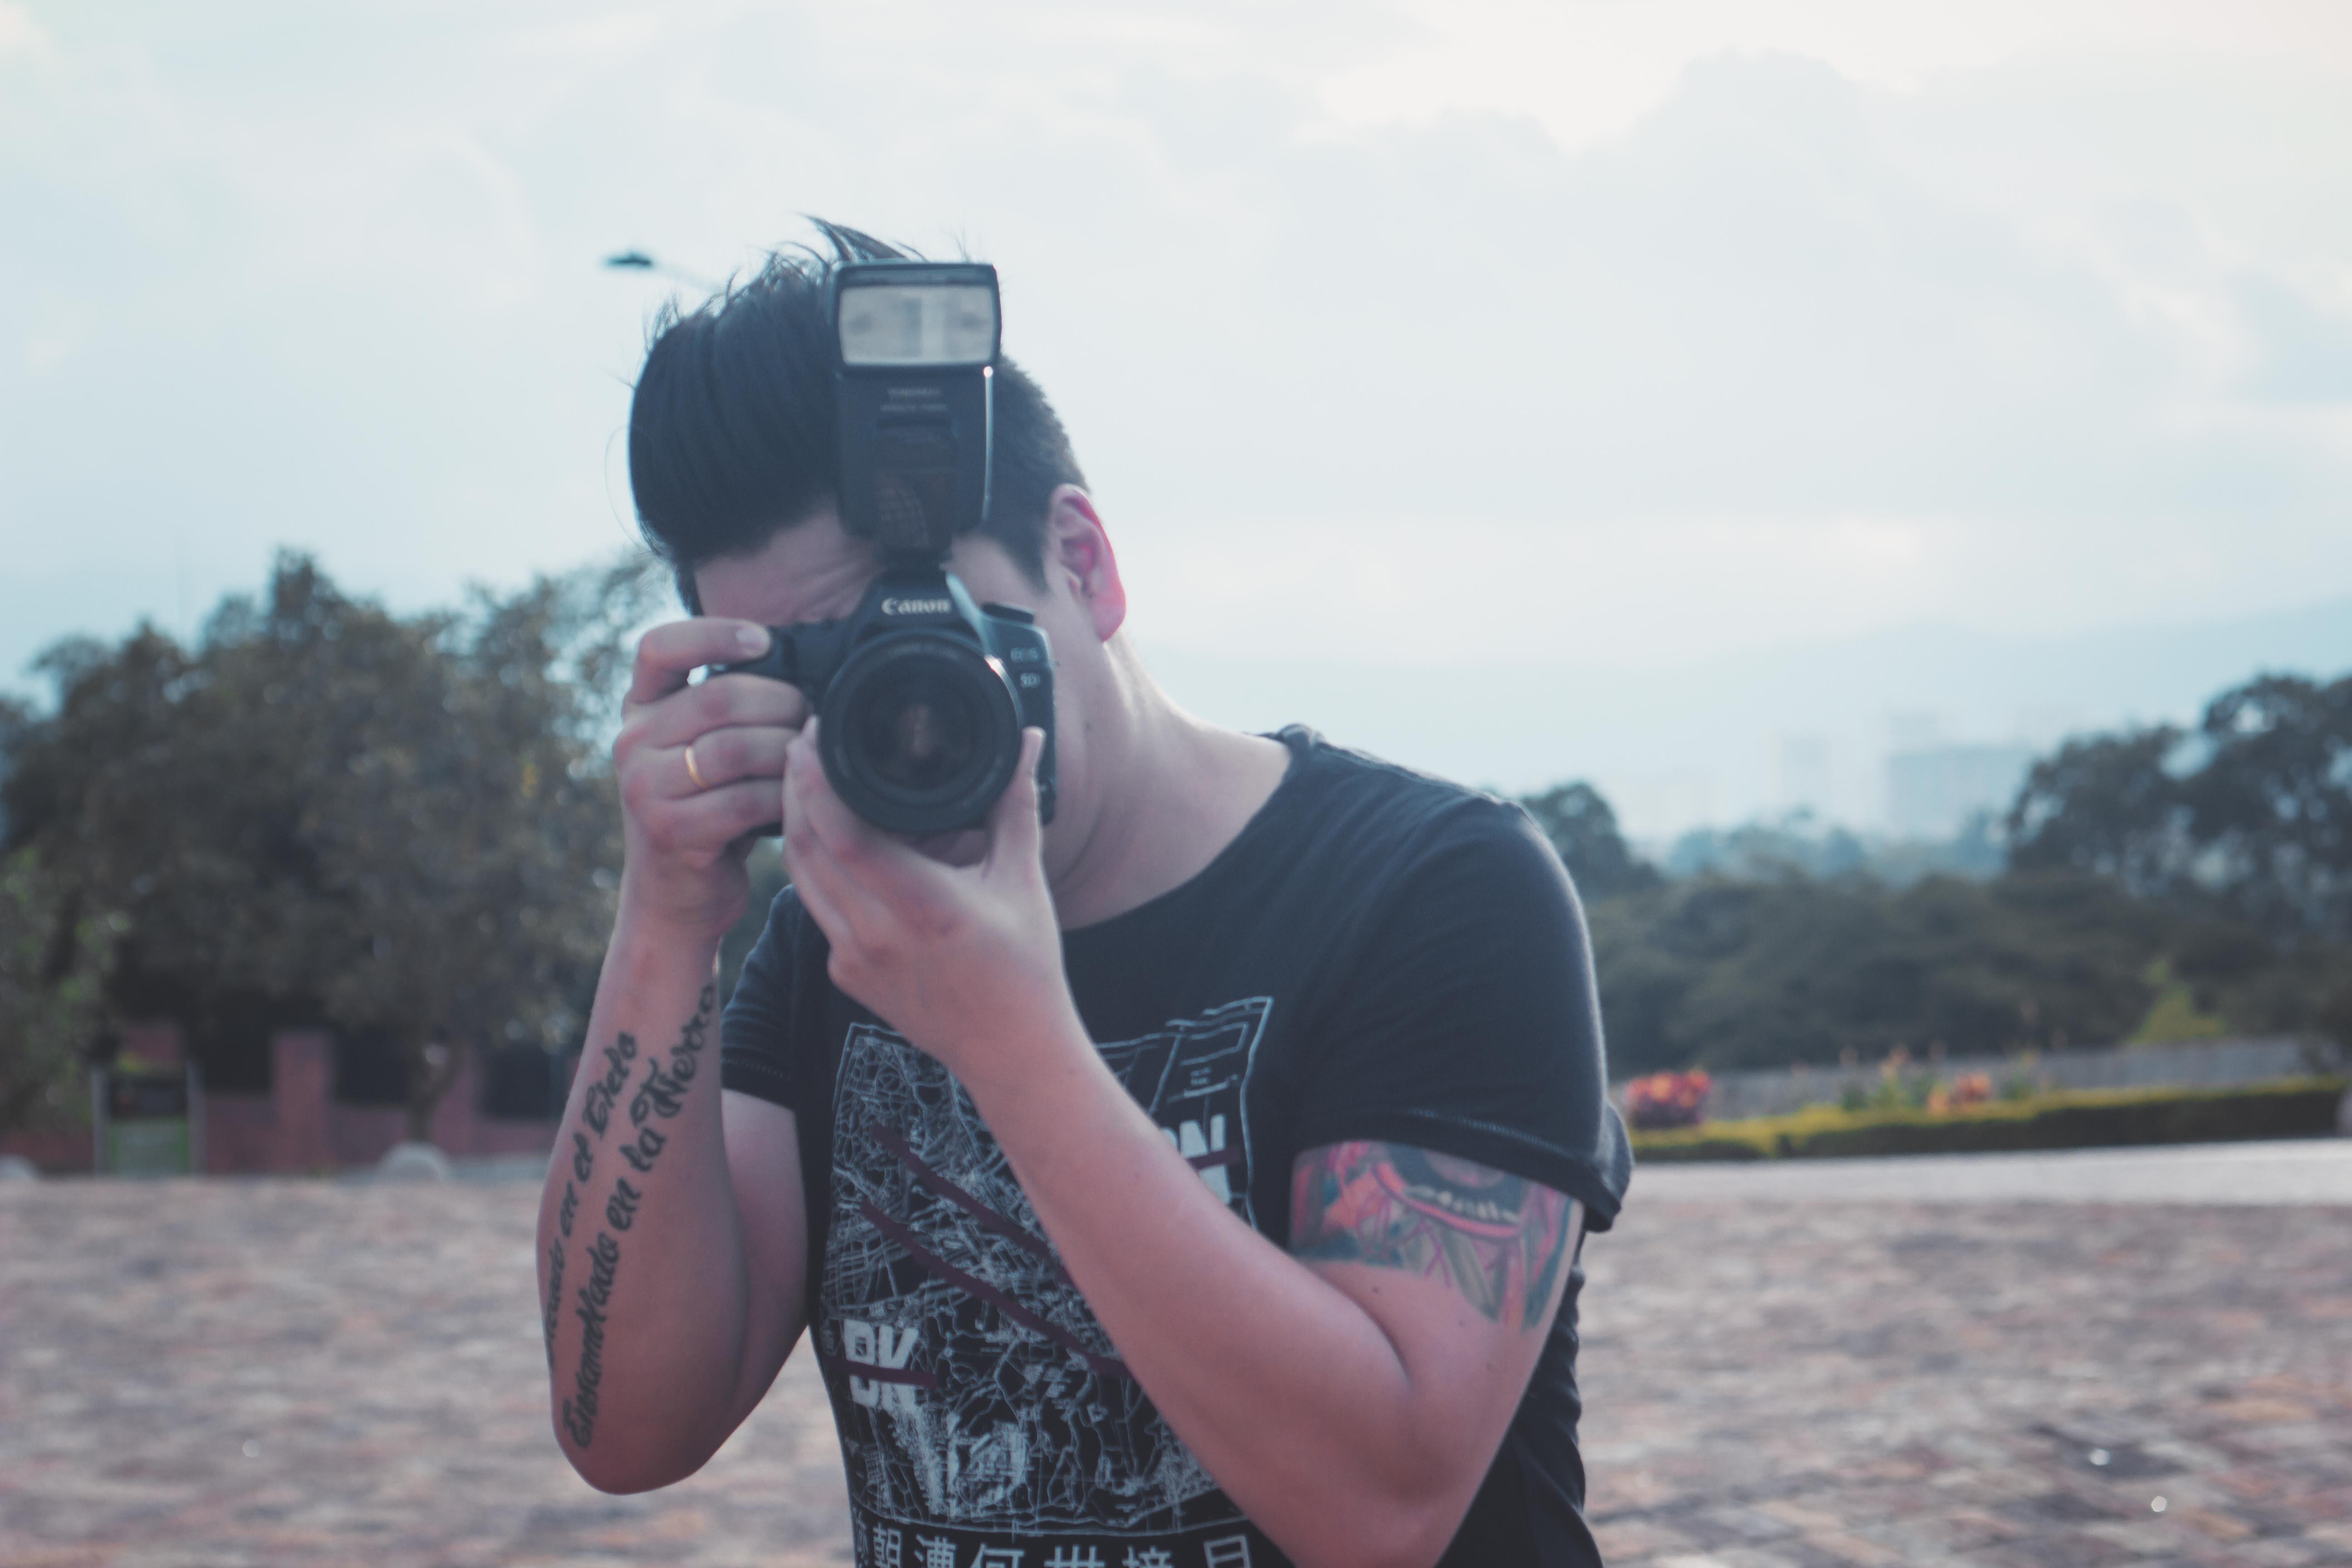 Go to juan pablo rodriguez's profile